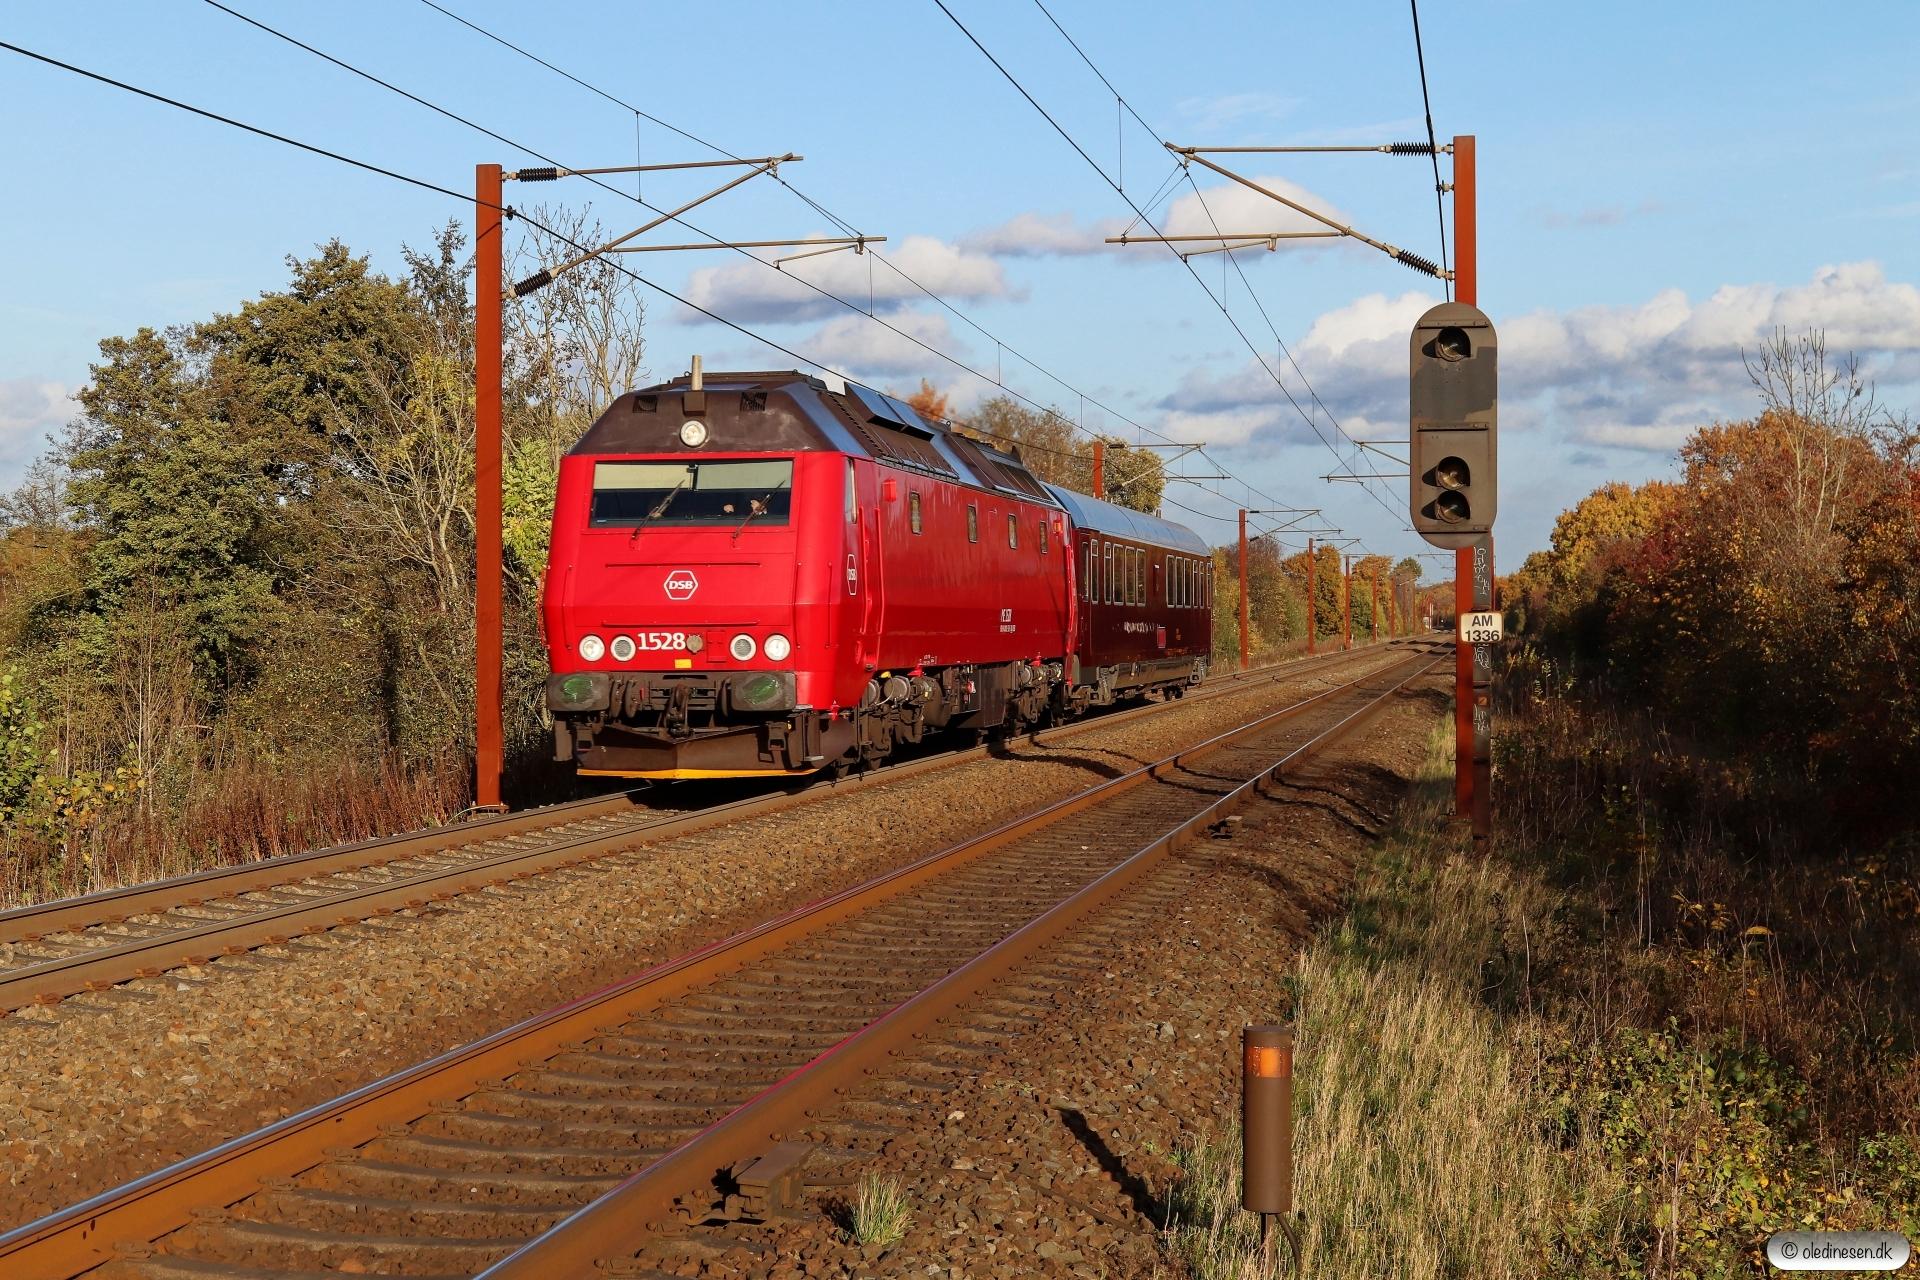 DSB ME 1528+S 001 som EP 8325 Kh-Hb. Km 165,0 Kh (Odense-Holmstrup) 28.10.2020.